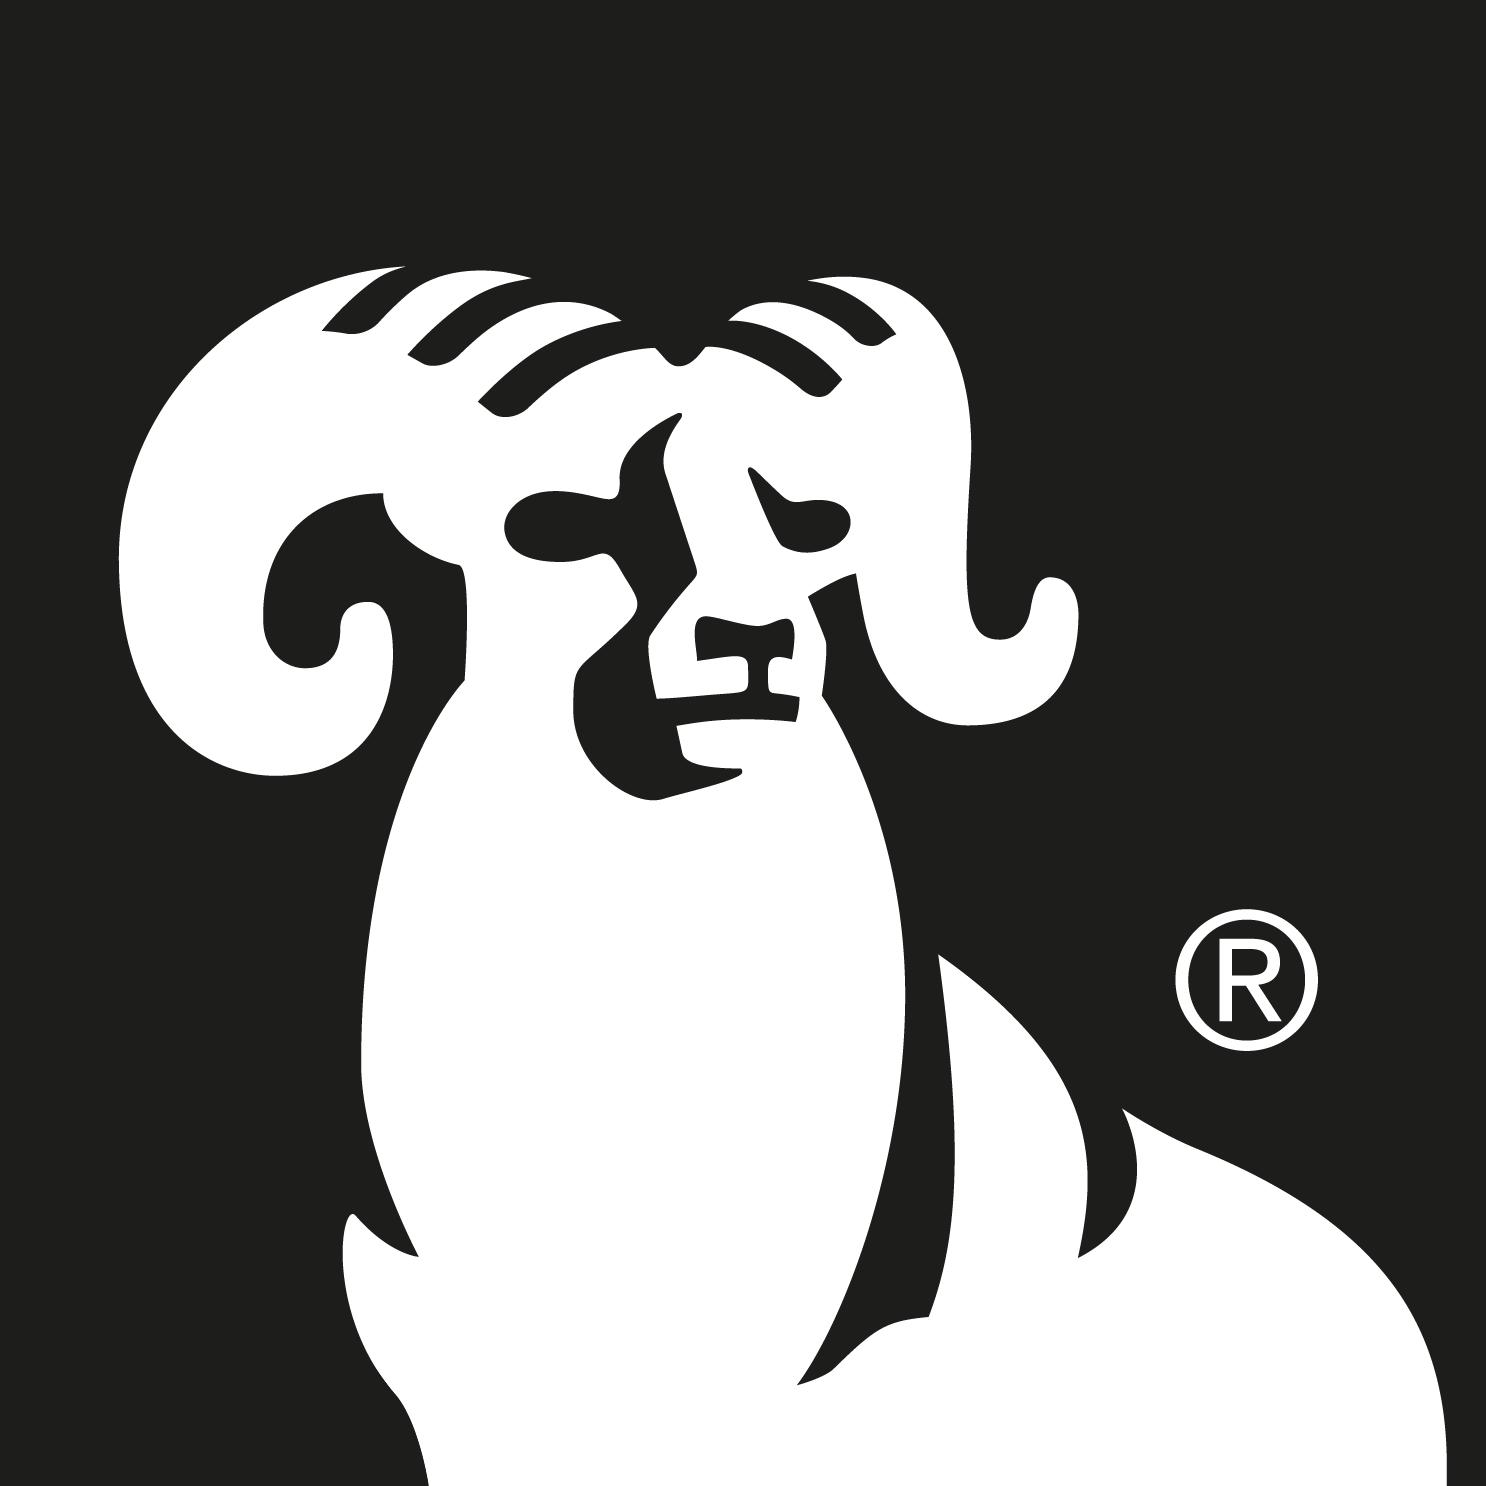 T. Rowe Price Logo png